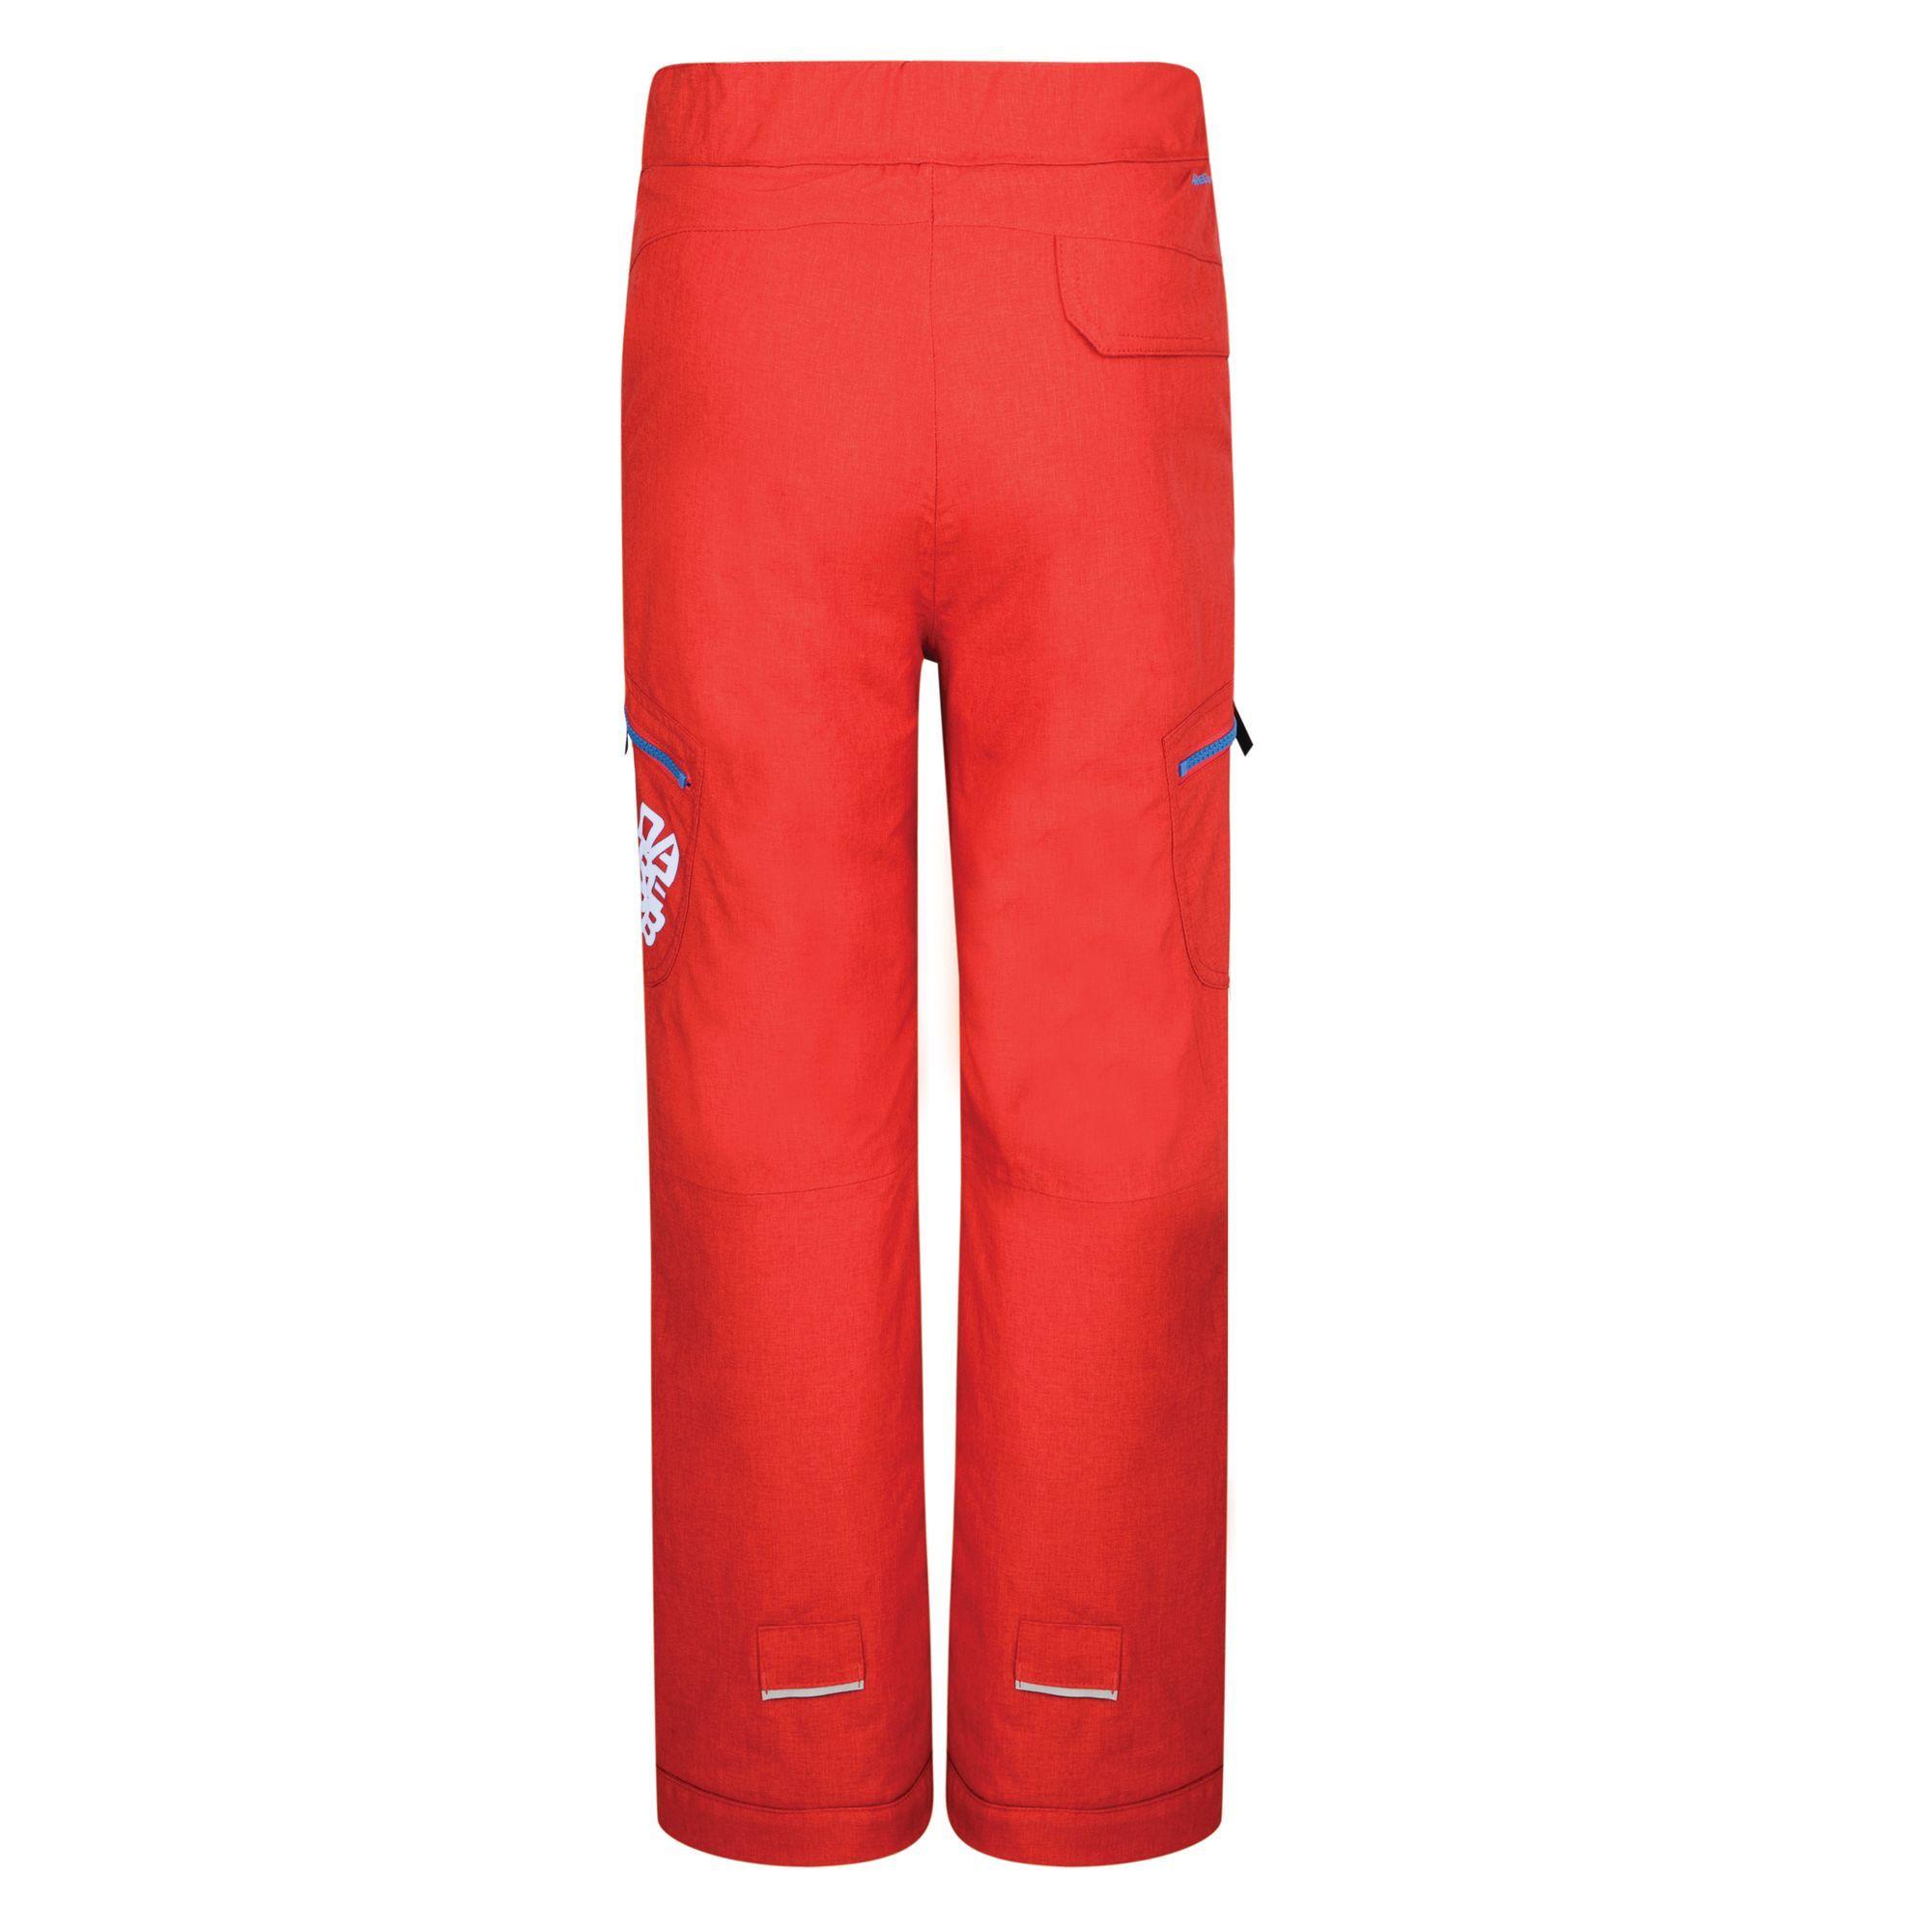 Dare2b-Boys-Girls-Kids-Waterproof-Breathable-Ski-Trousers-Salopettes-RRP-70 thumbnail 4